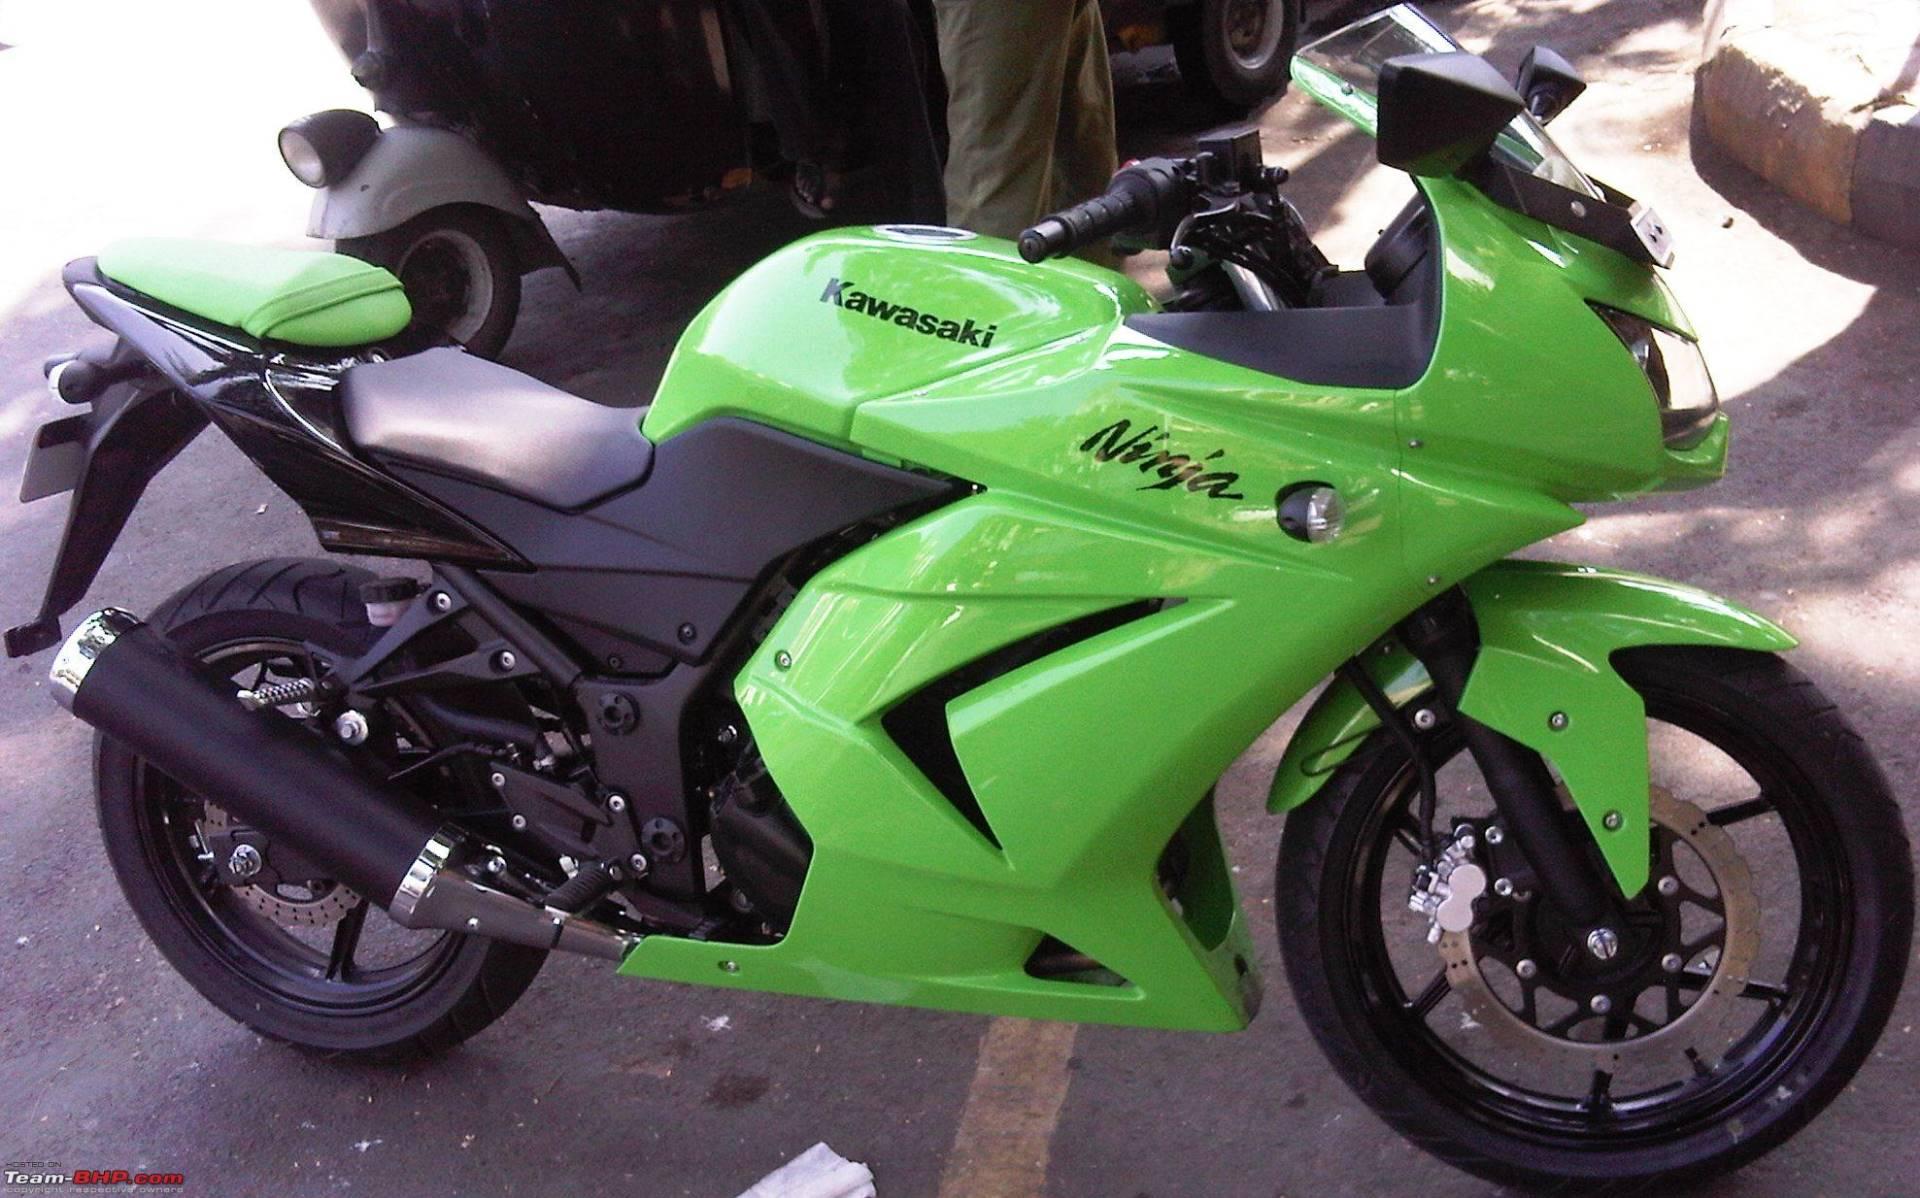 Used 2010 Kawasaki Ninja® 250R Motorcycles in Brooklyn, NY | Stock ...